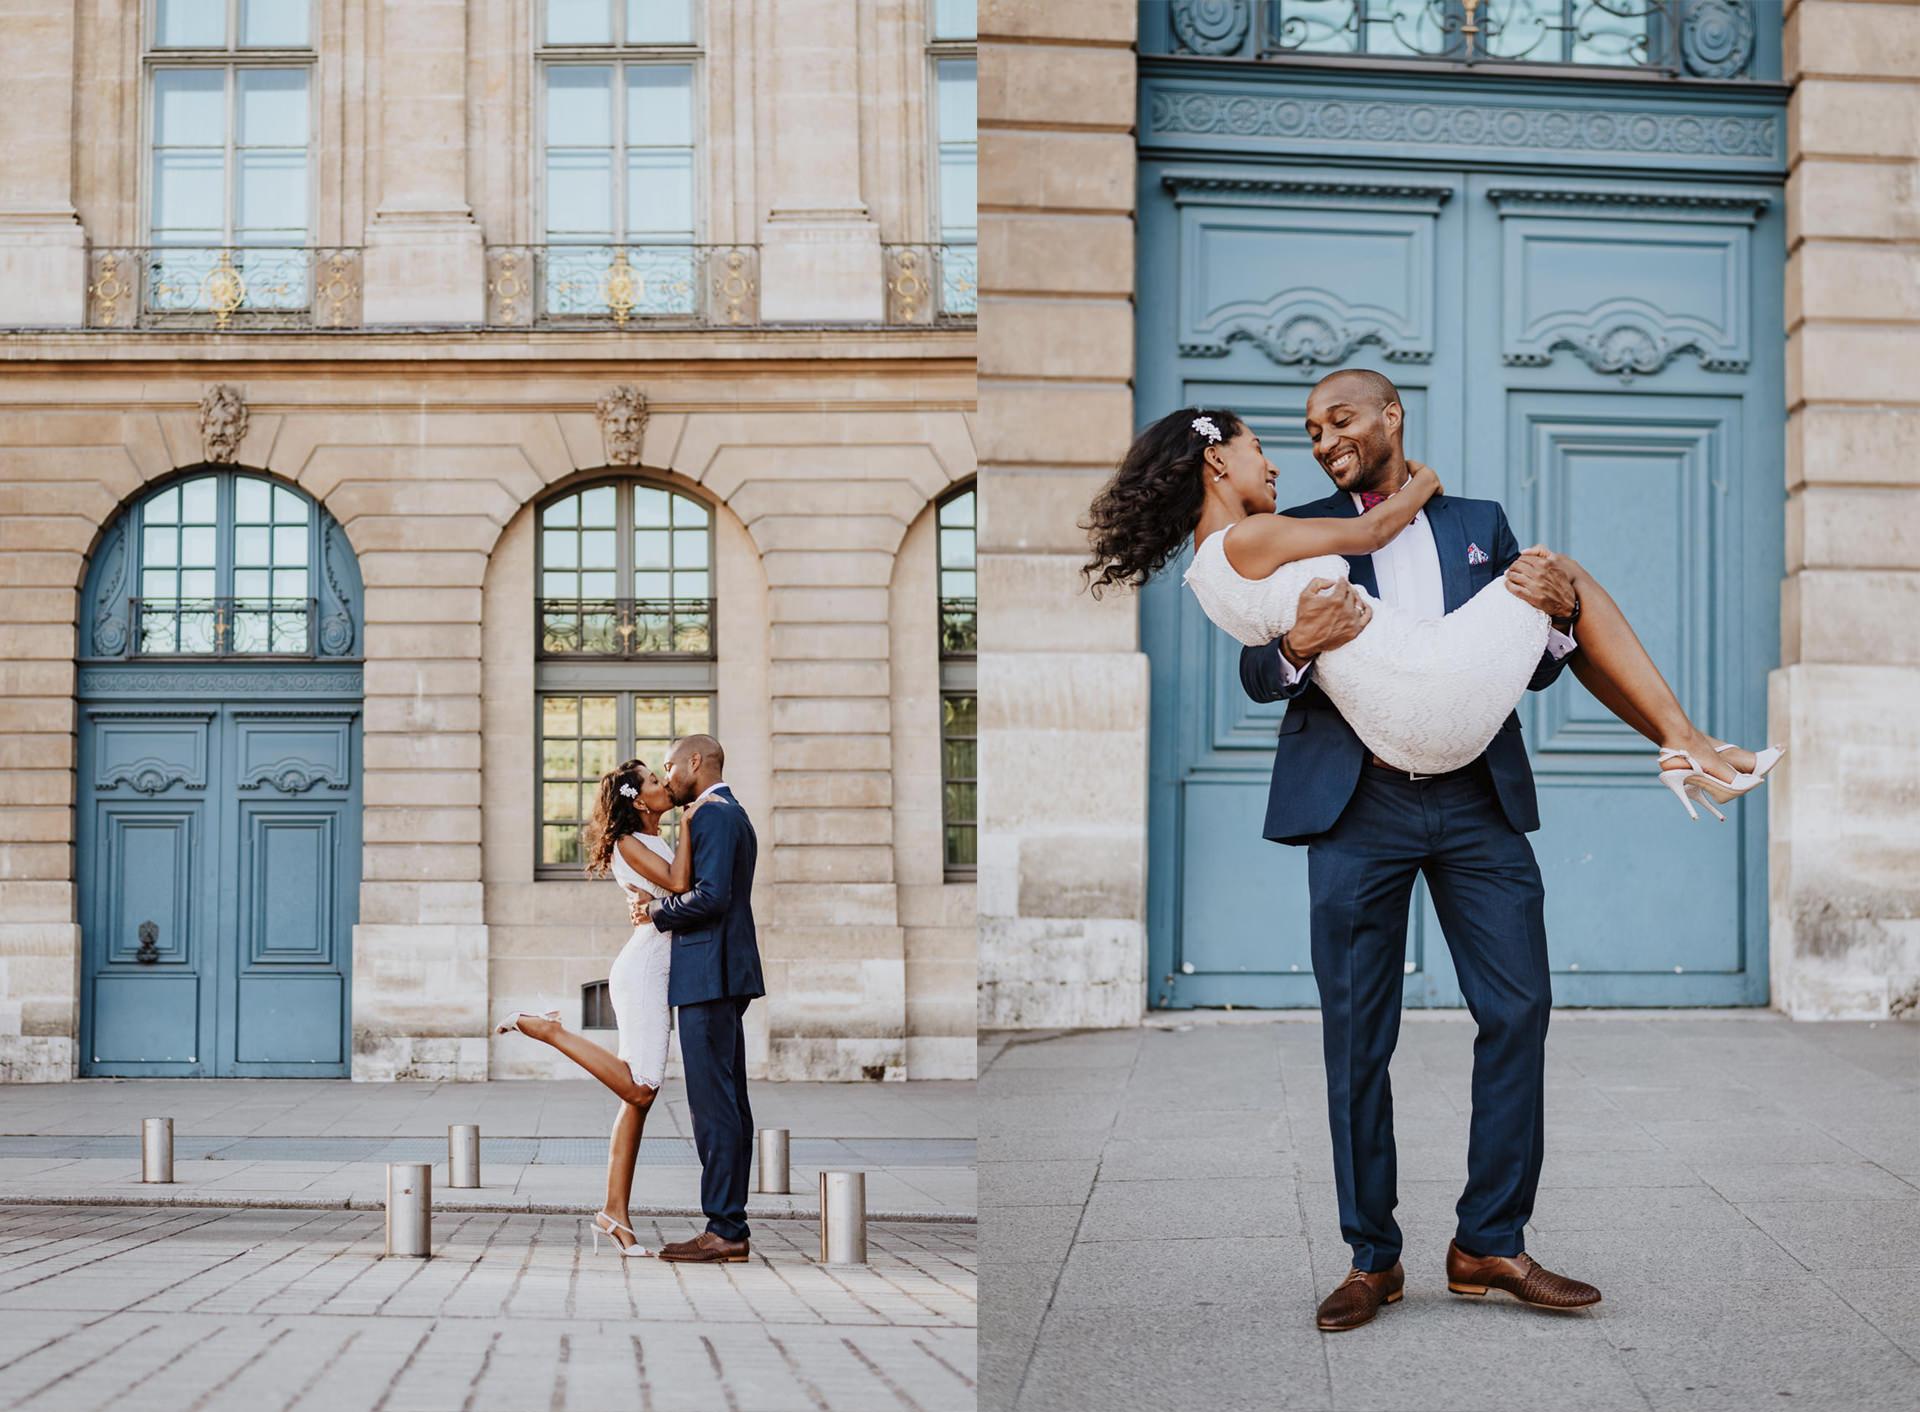 Paris mariage photographer